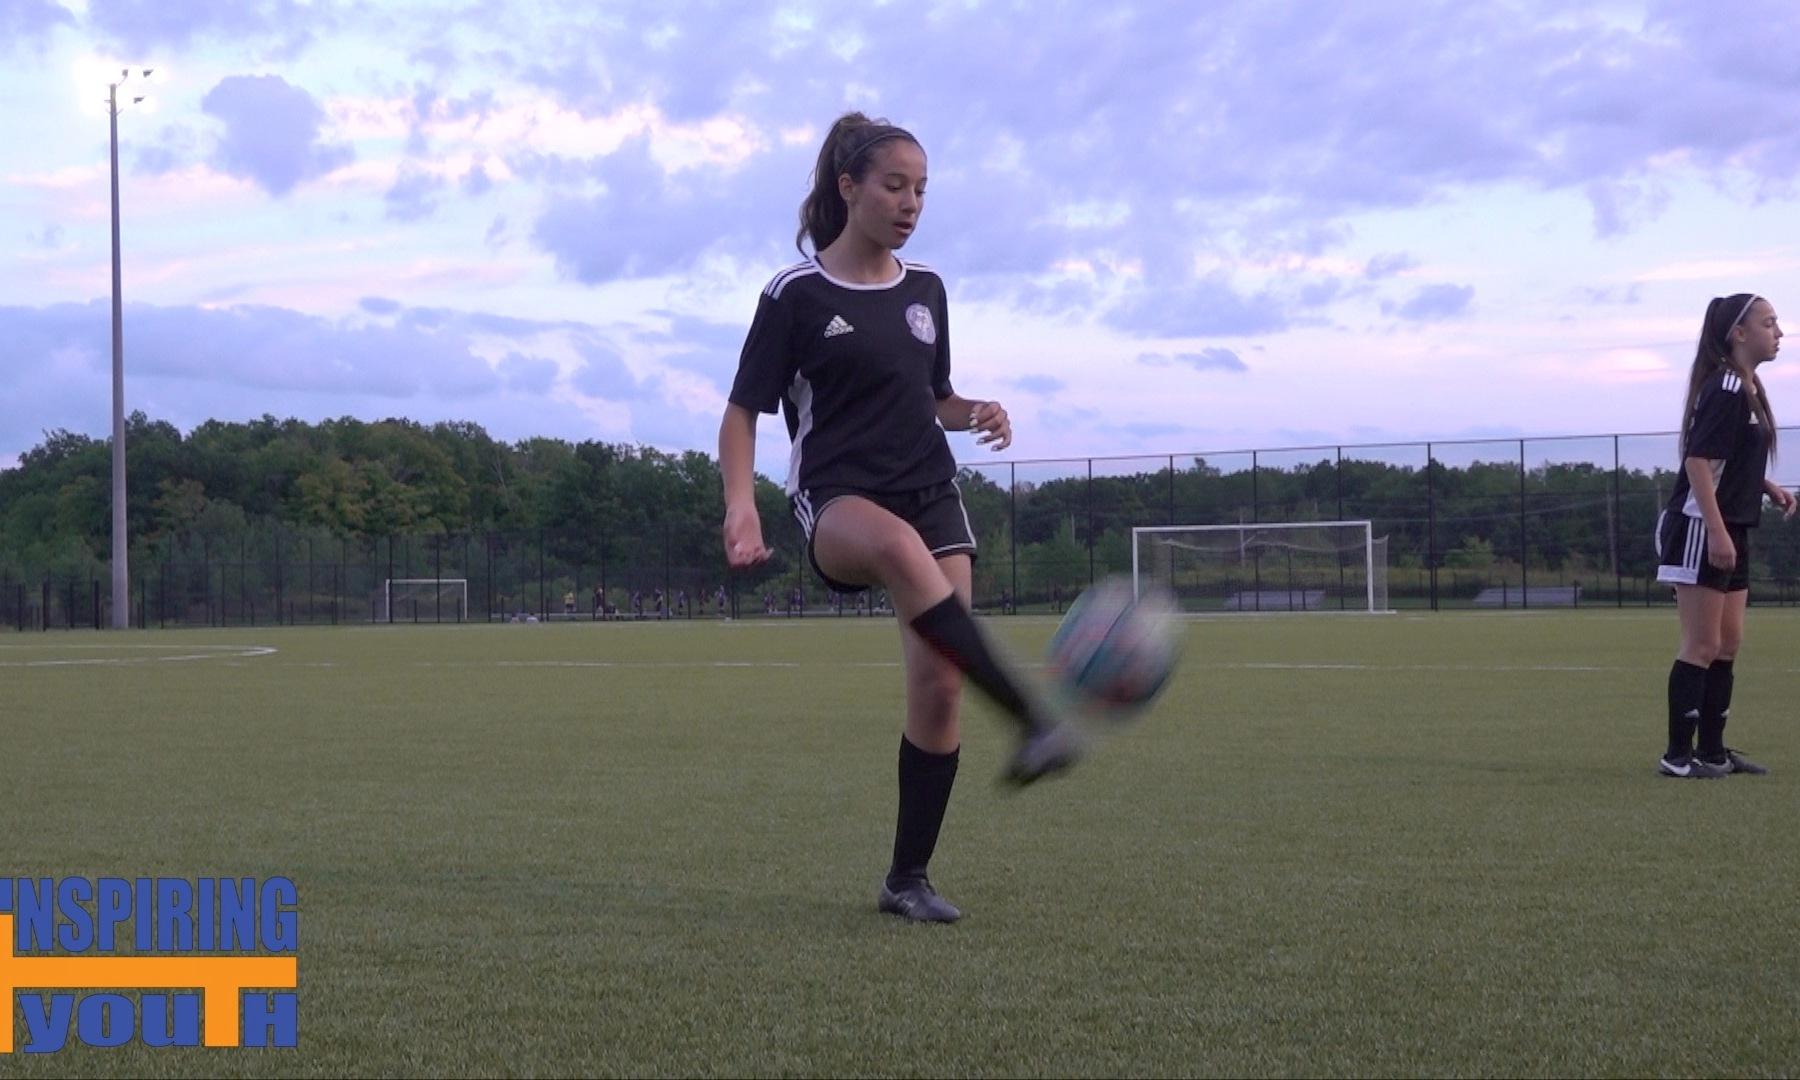 IY-S5-S2-Inspiring Youth-Burlington Soccer